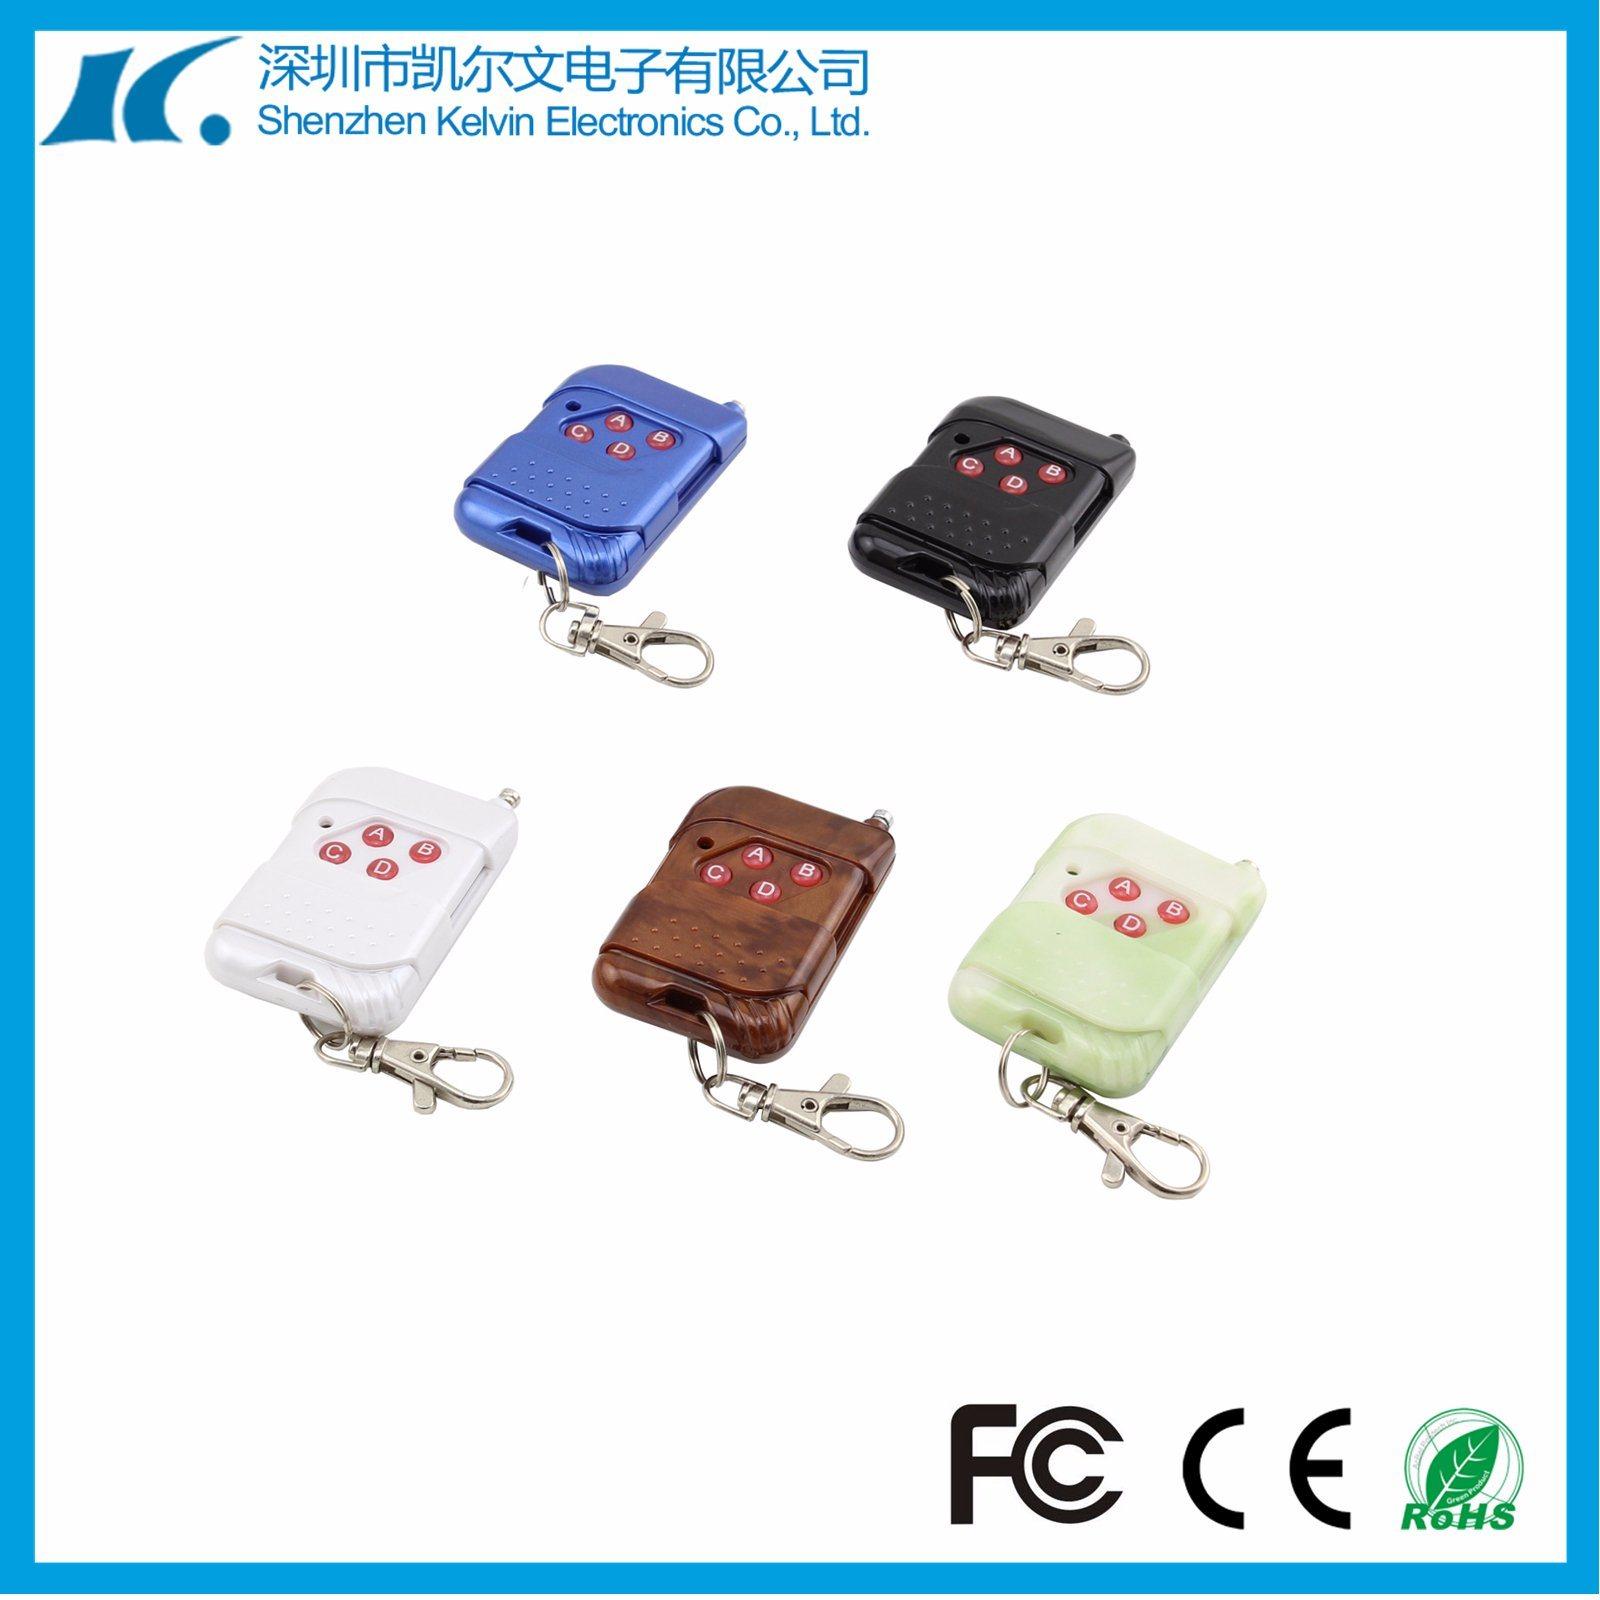 Universal 433MHz 2/4 Buttons Keyfob Kl300-4k